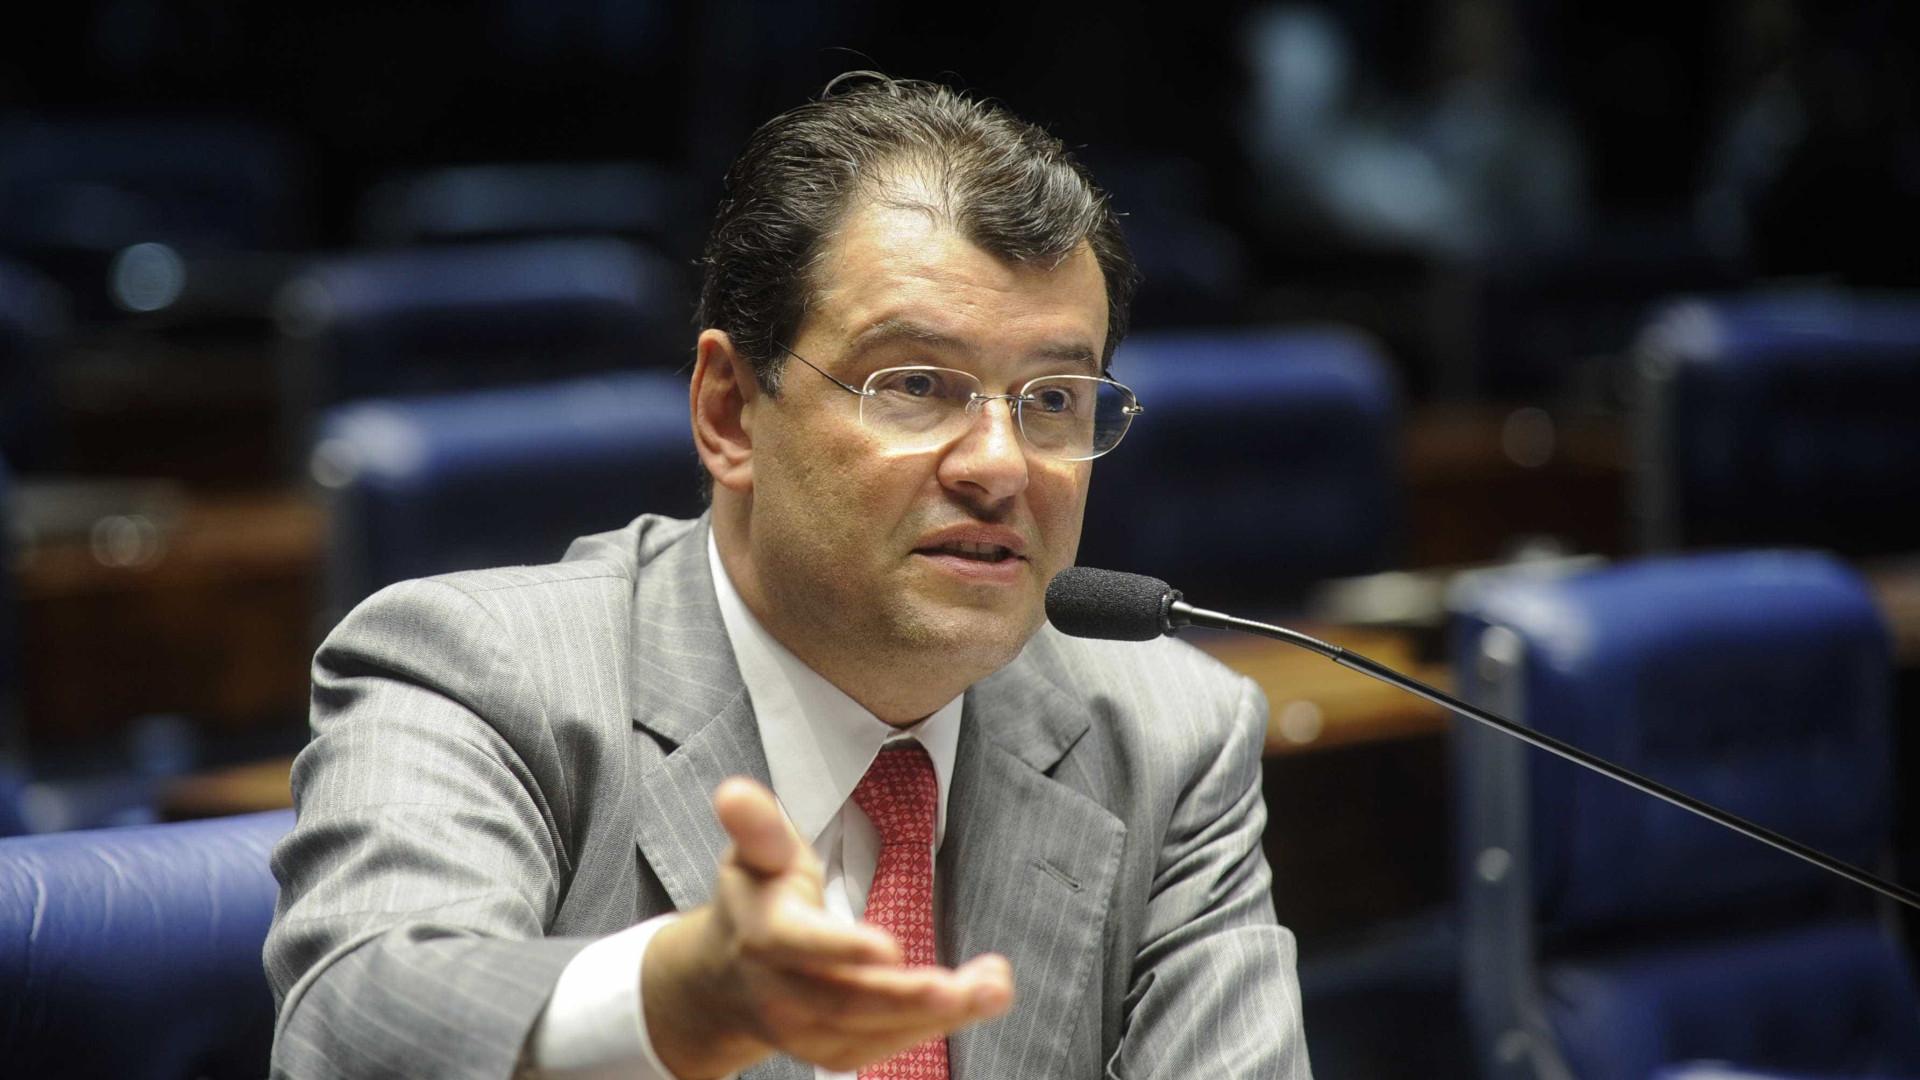 Braga diz que marco de saneamento deve ser votado sem surpresa